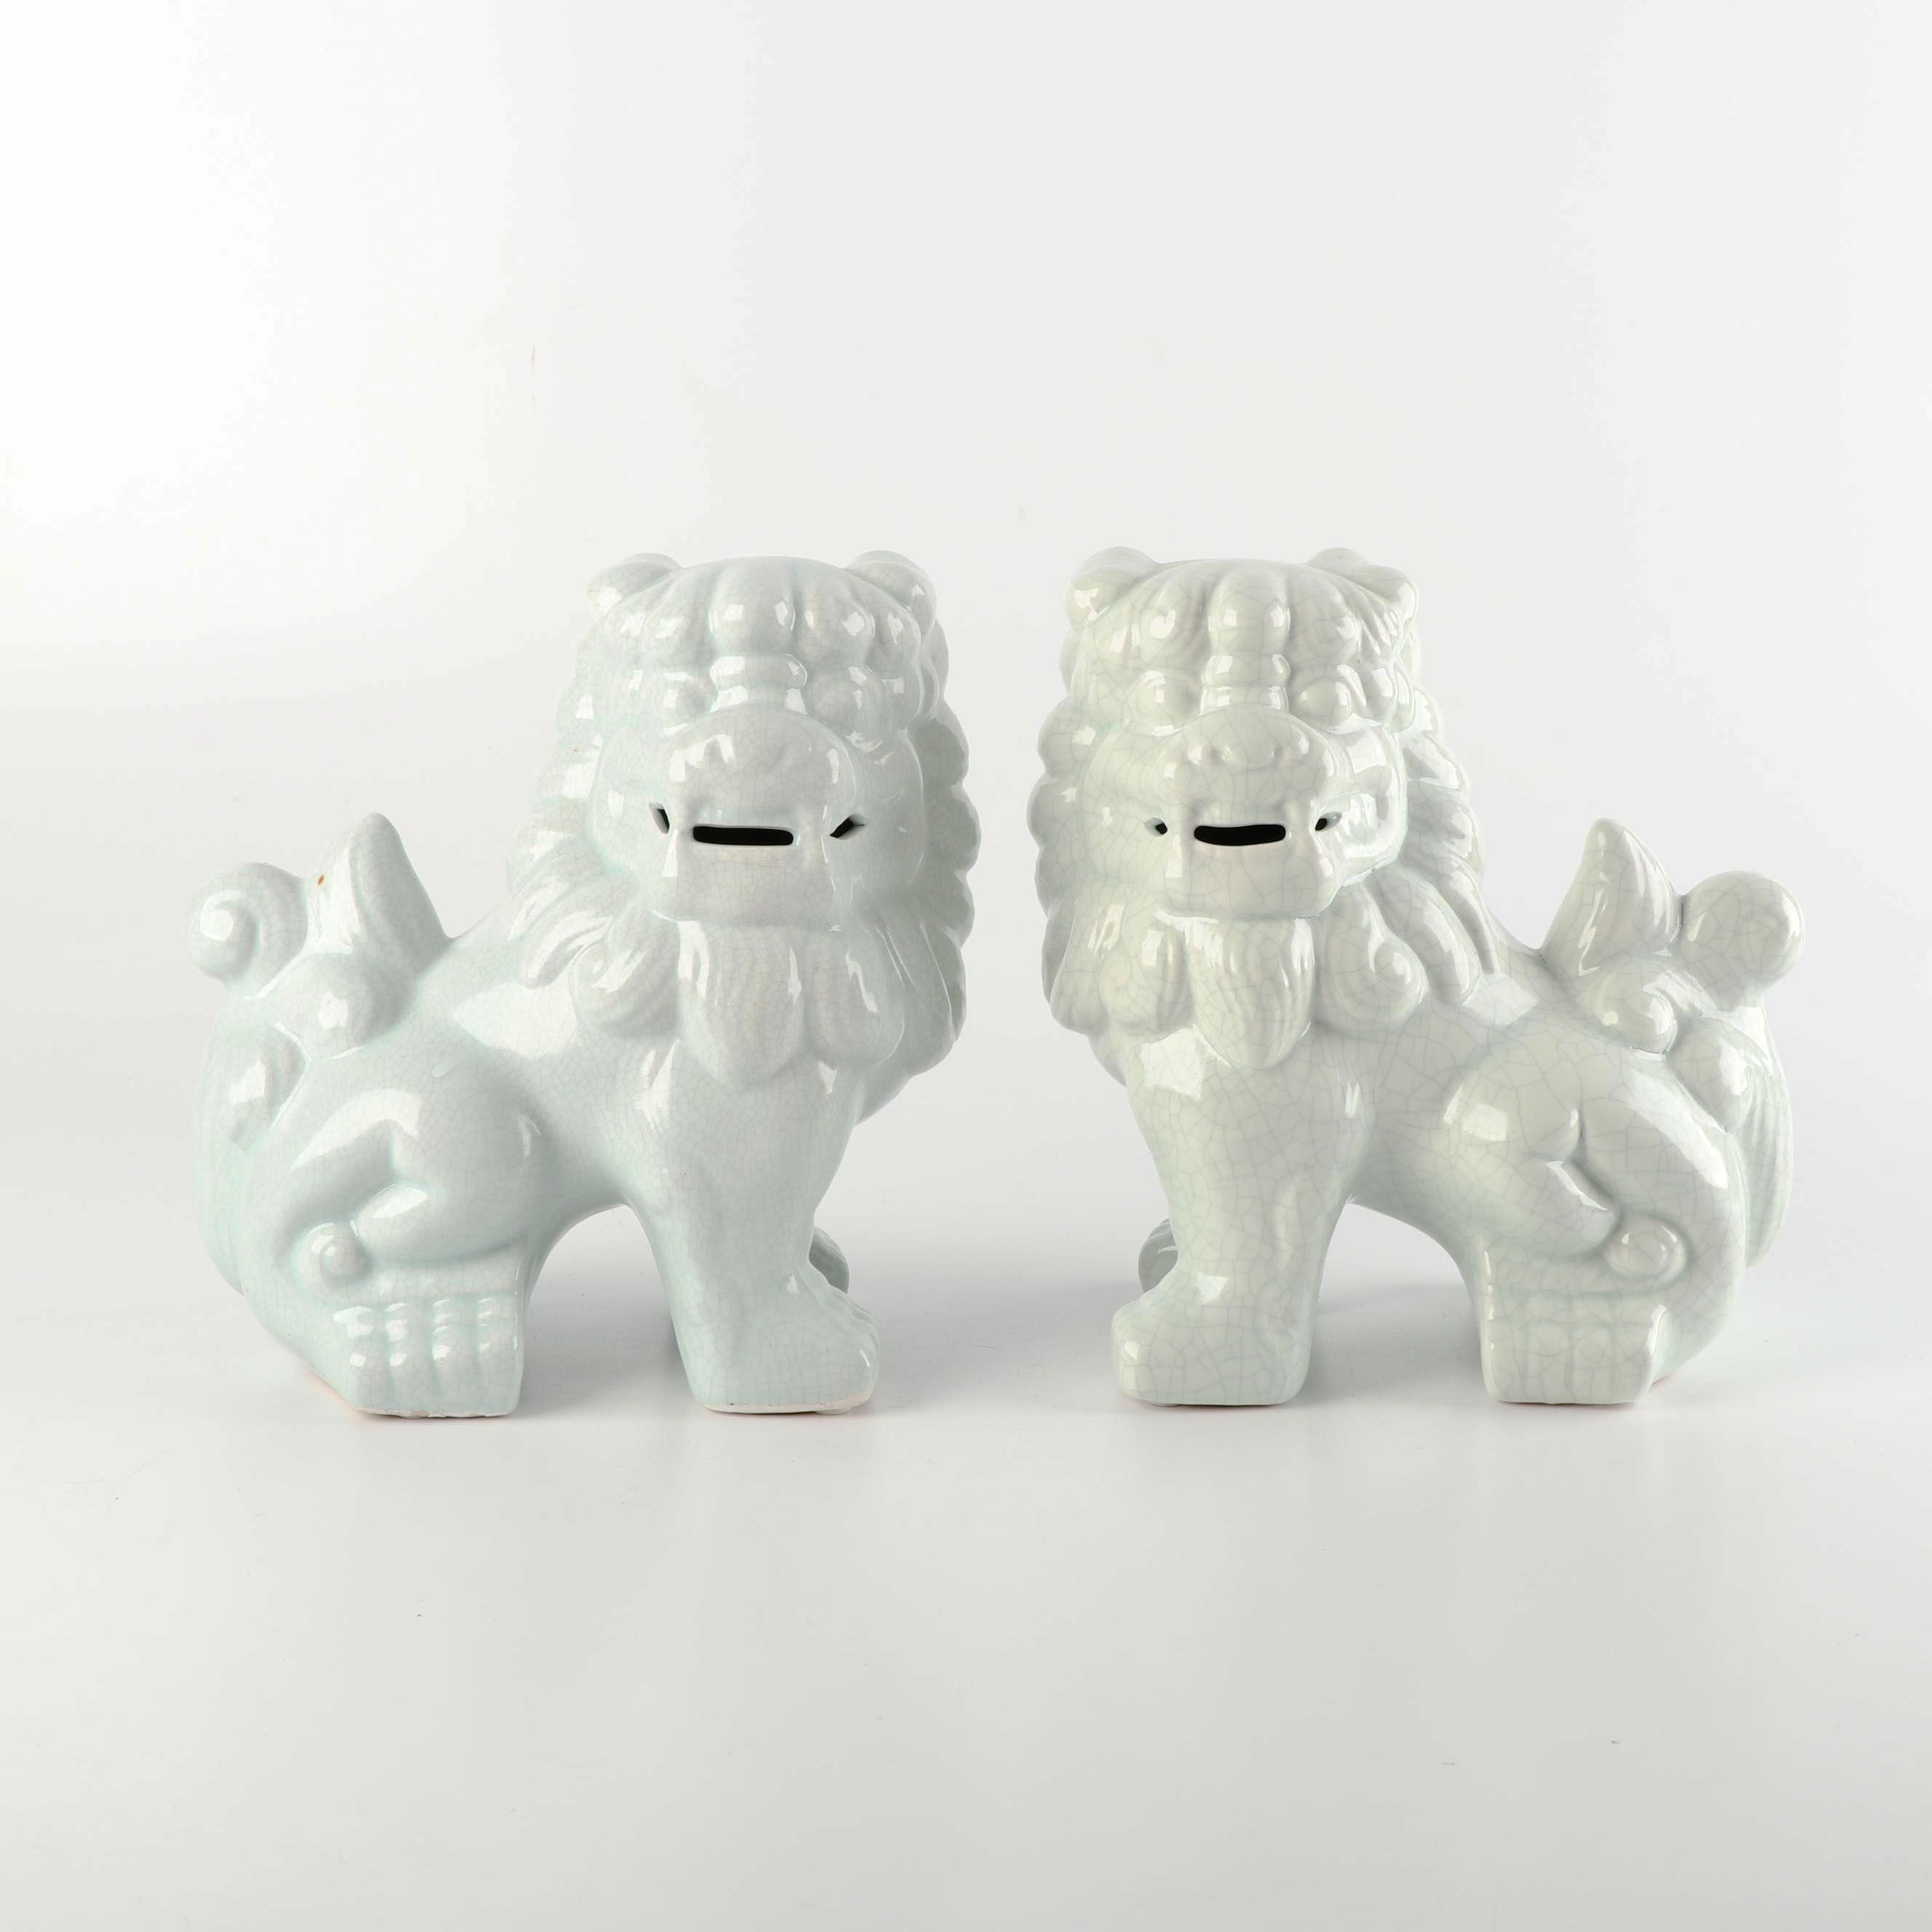 Ceramic Chinese Guardian Lion Figurines